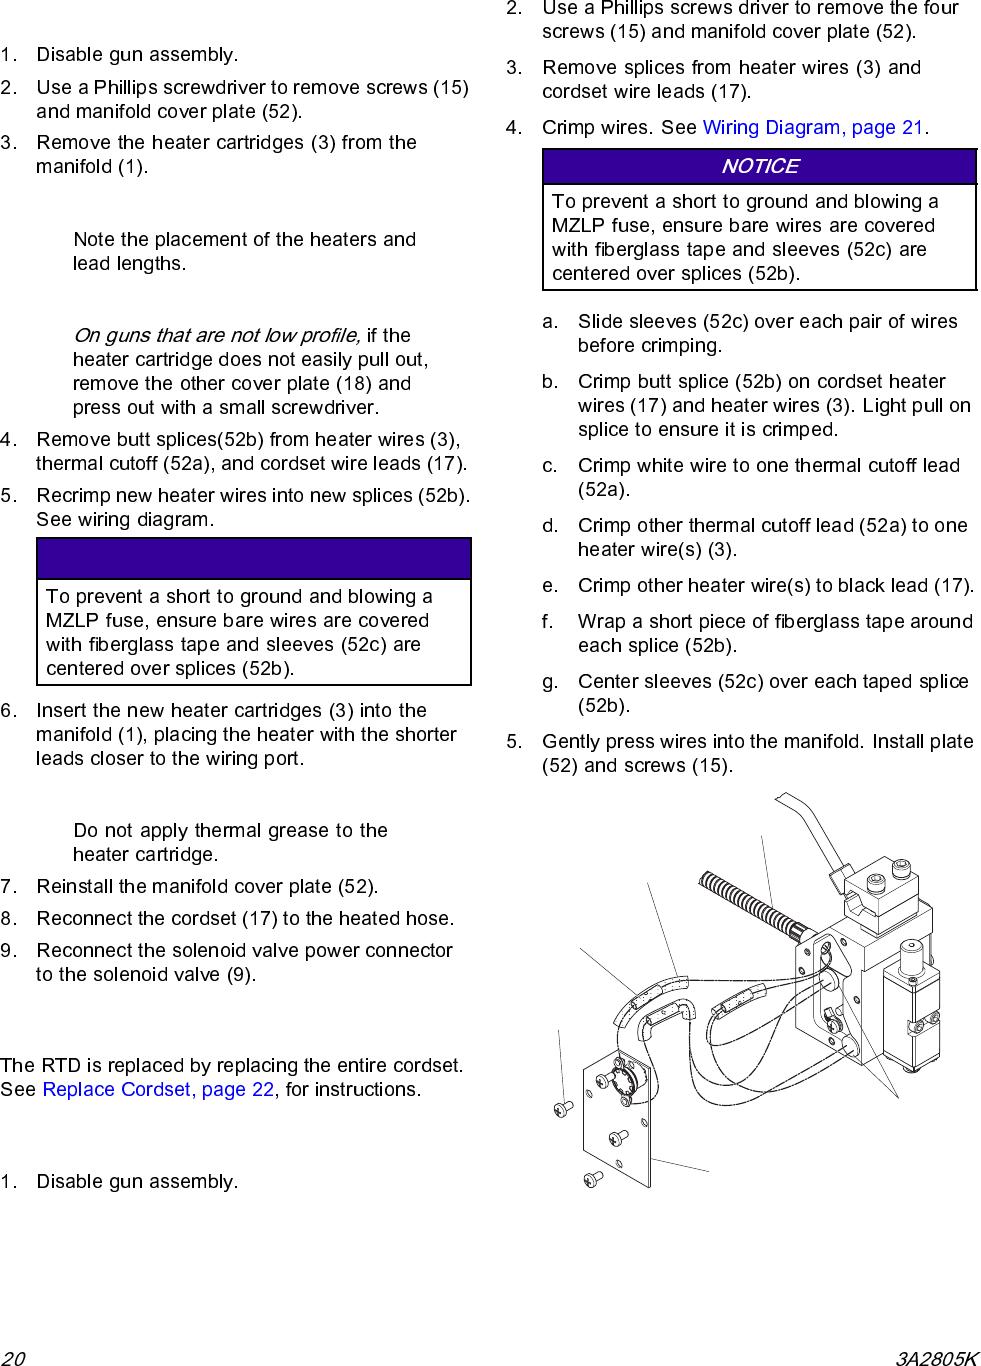 Graco 3a2805k Invisipac Gs35 Users Manual Plug Free Hot Melt Cartridge Heater Wiring Diagram Repair Replace